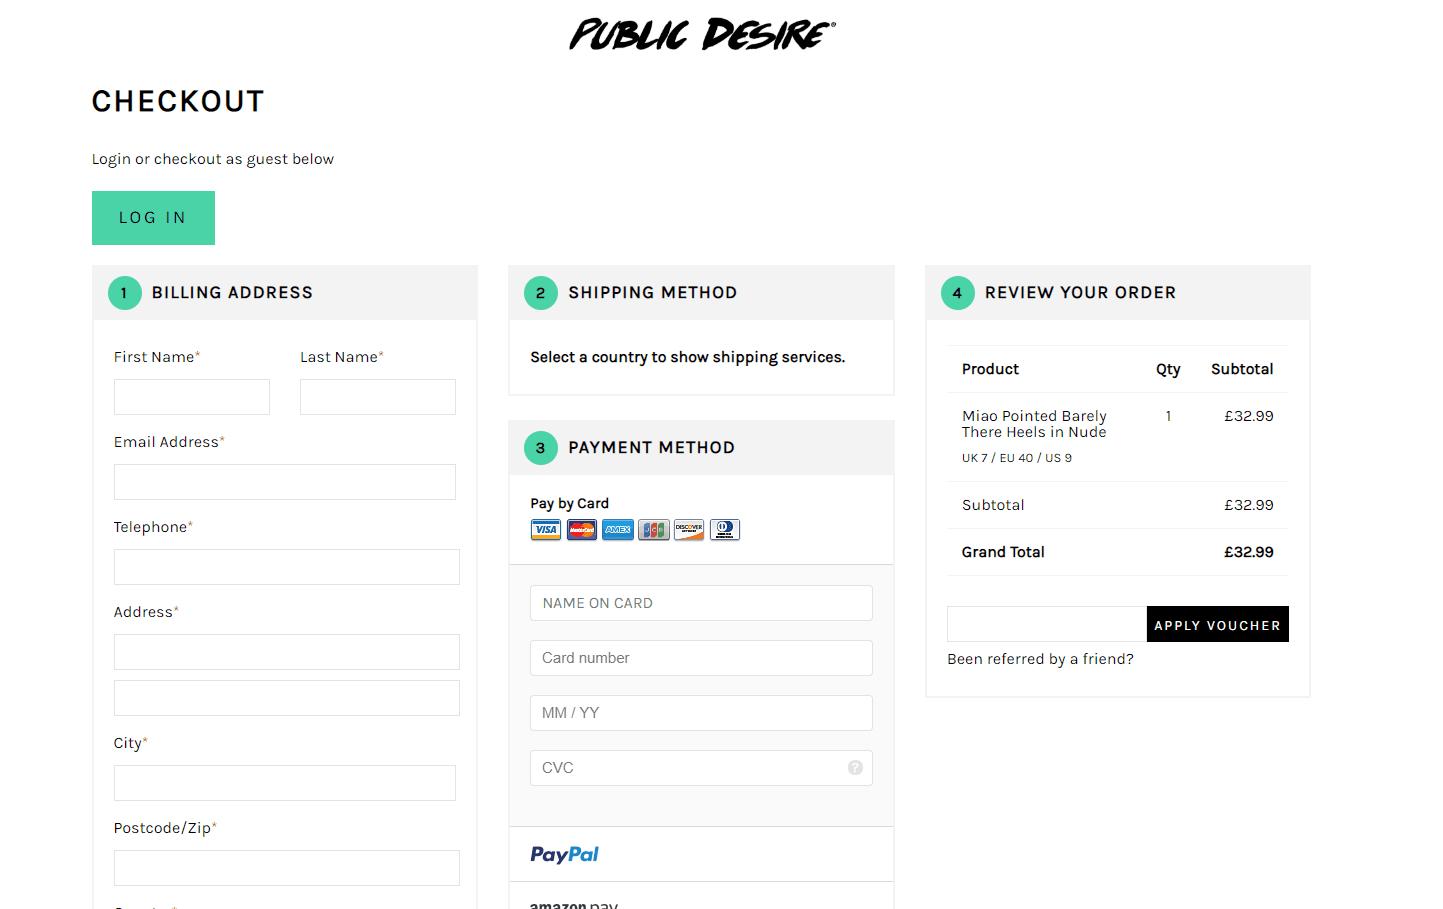 public desire check out